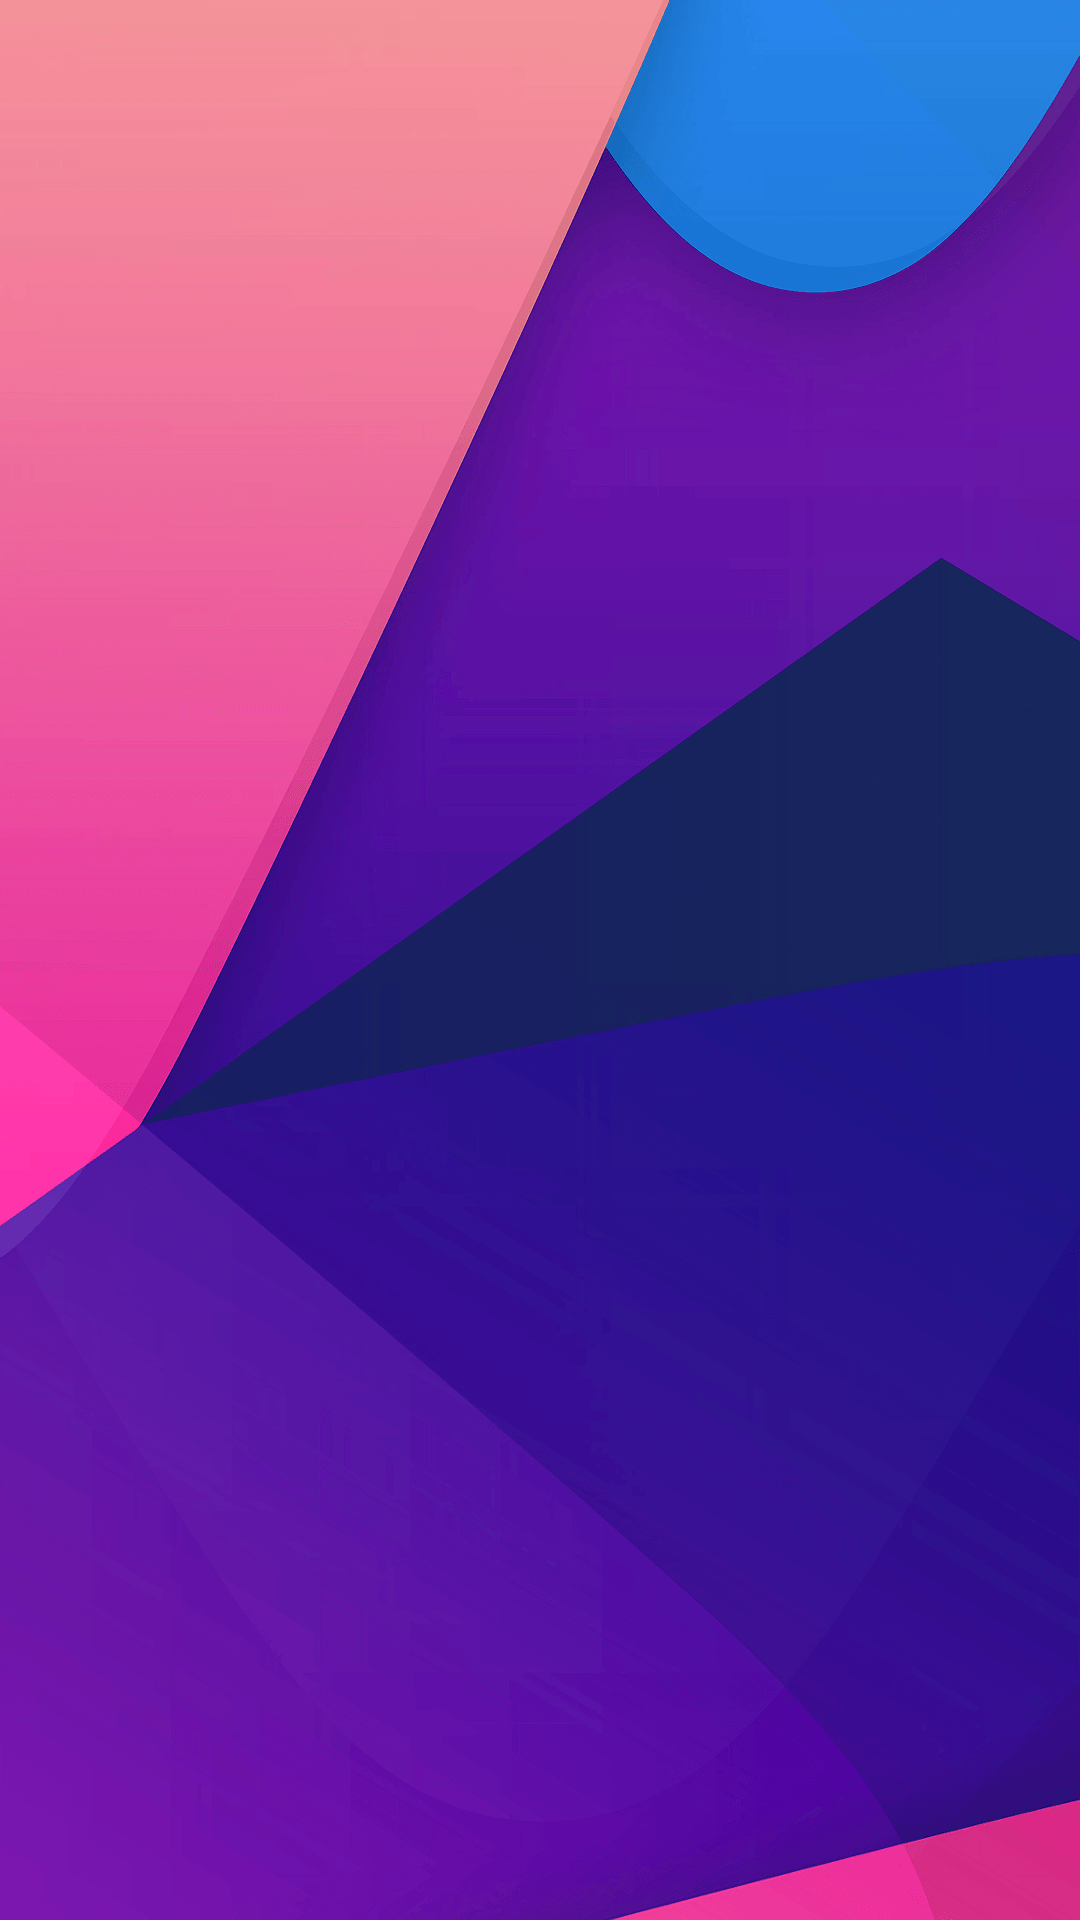 Hd wallpaper vivo - Vivo Xplay Conversions Wallpapers